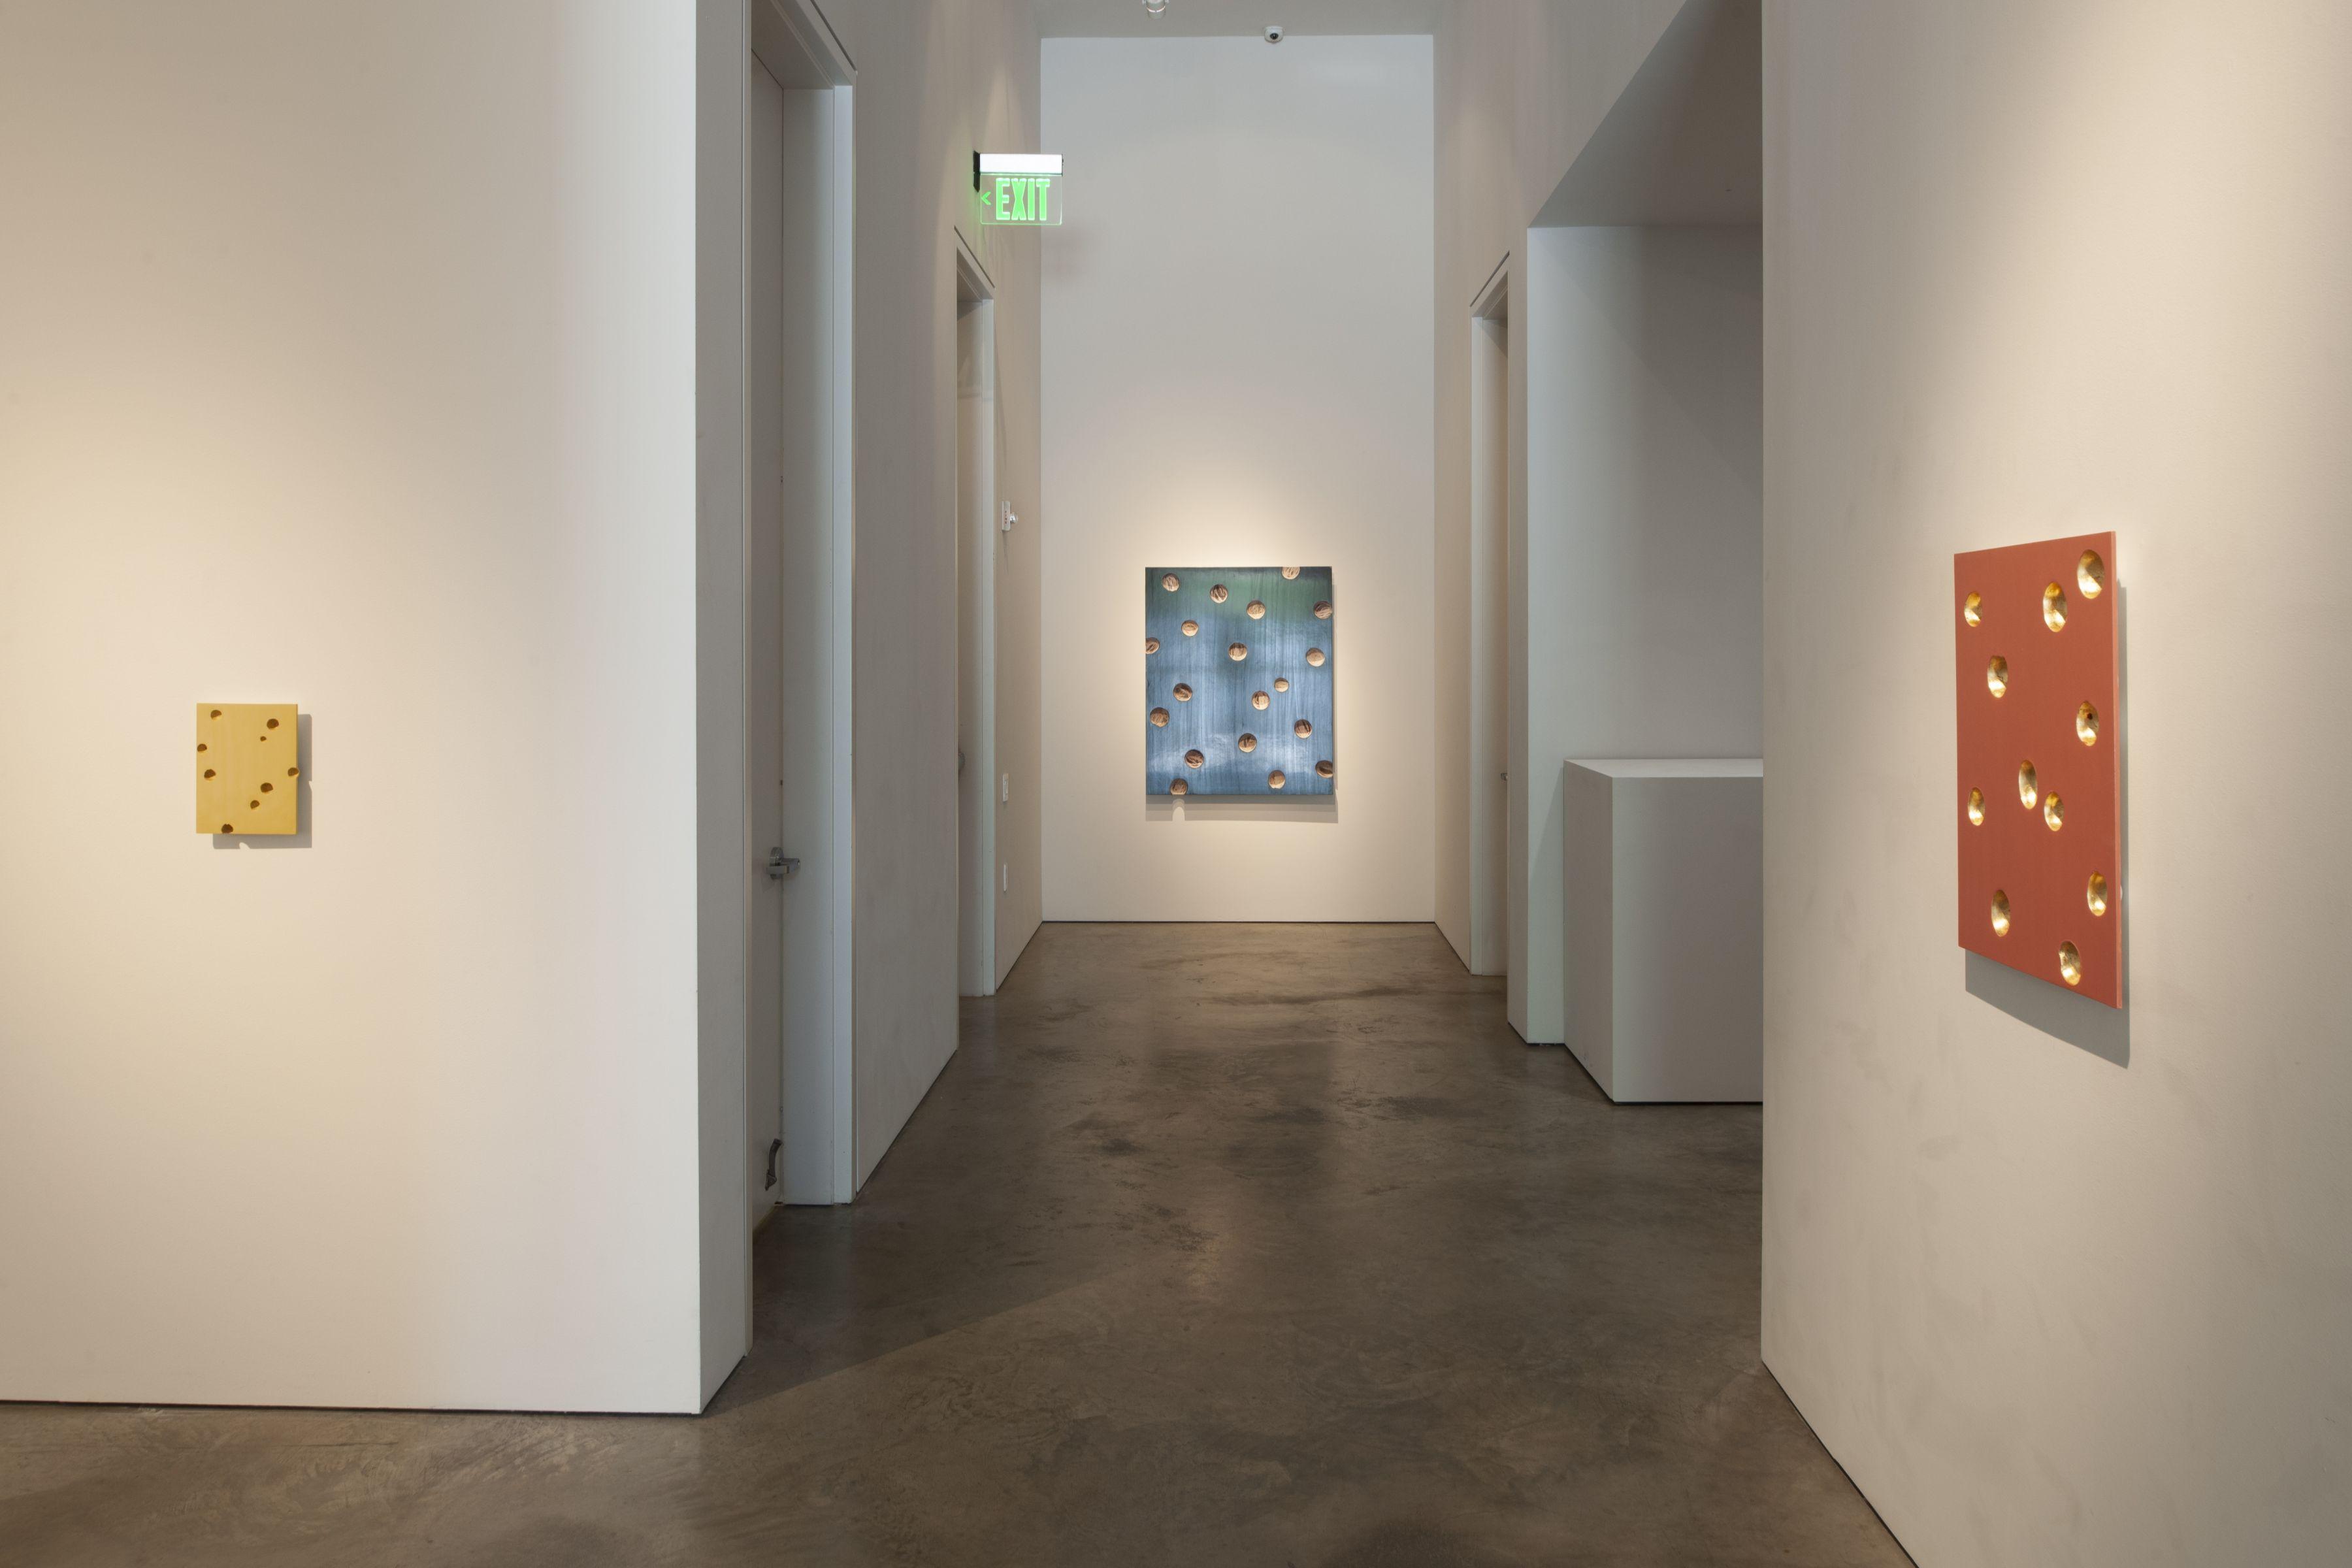 Thomas Glassford,Osculum.Sicardi | Ayers | Bacino, 2018